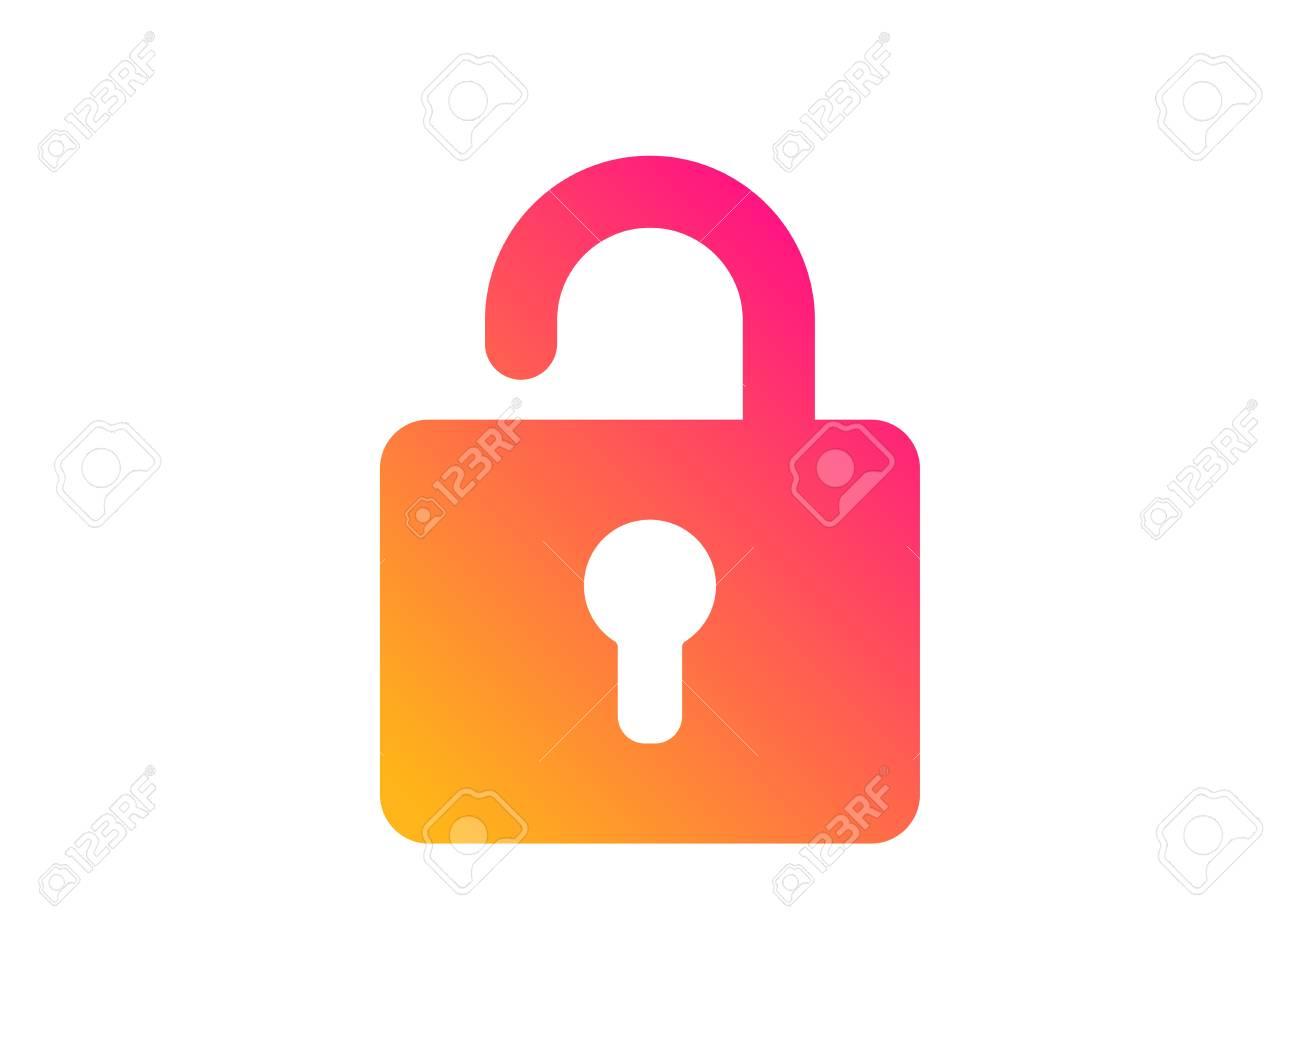 Lock icon. Private locker sign. Password encryption symbol. Classic flat style. Gradient lock icon. Vector - 123159587